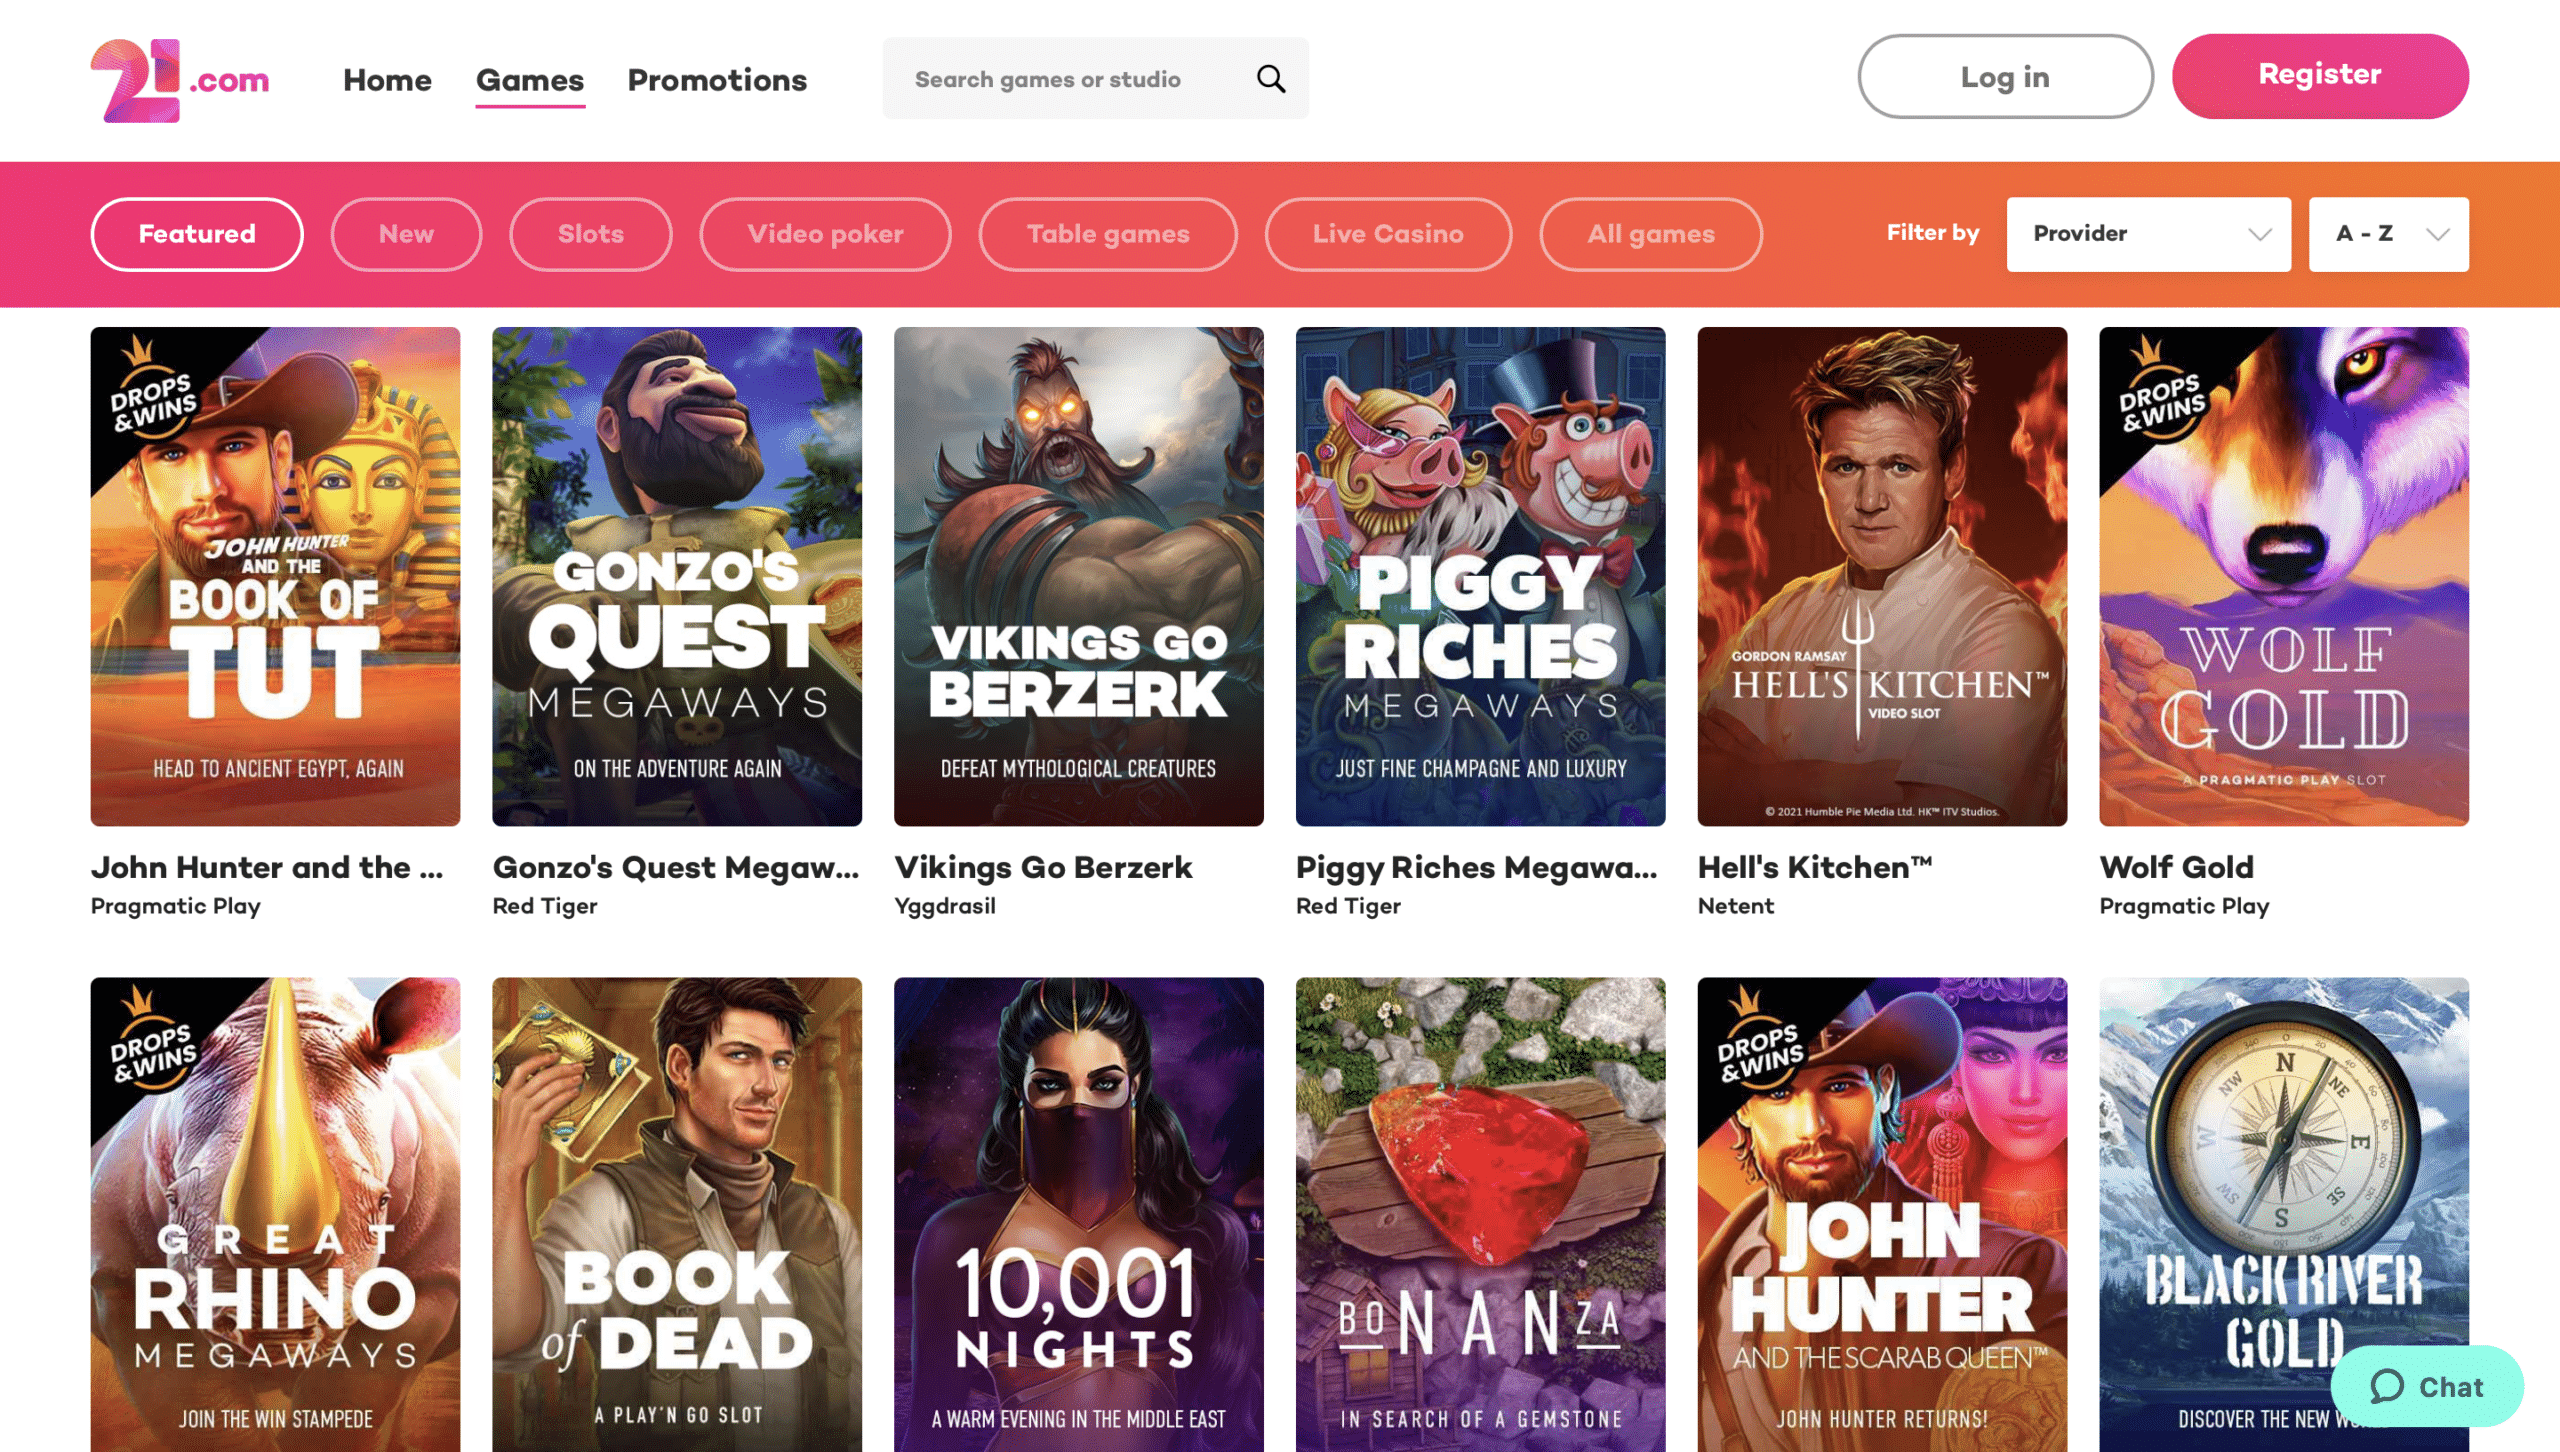 21.com Game Selection